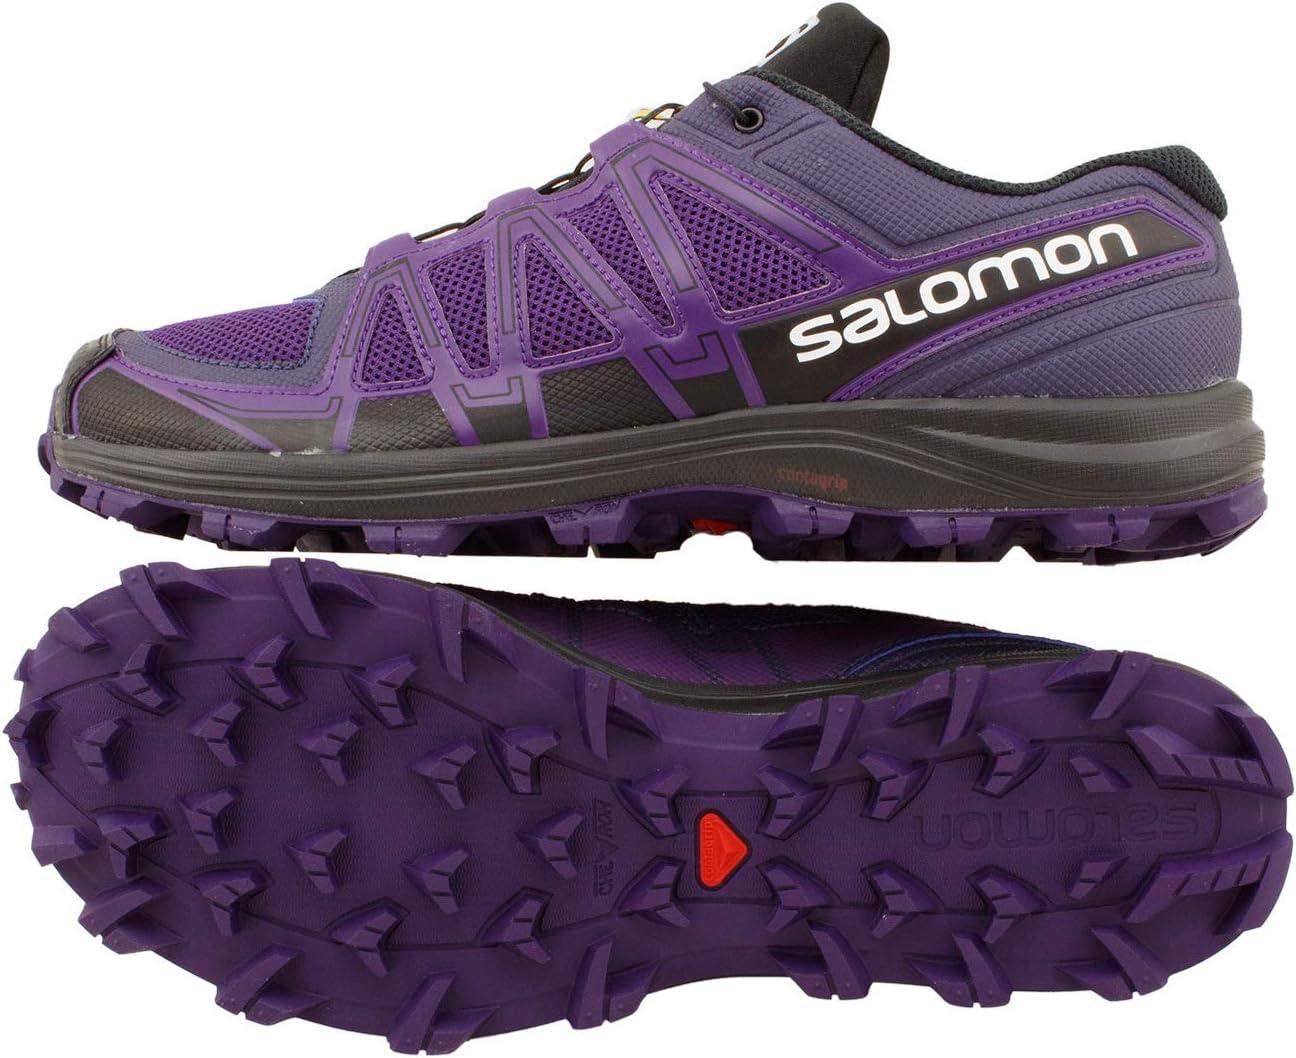 SALOMON Fellraiser Trail Running Schuhe Laufschuhe 36 37 38 FTKpx